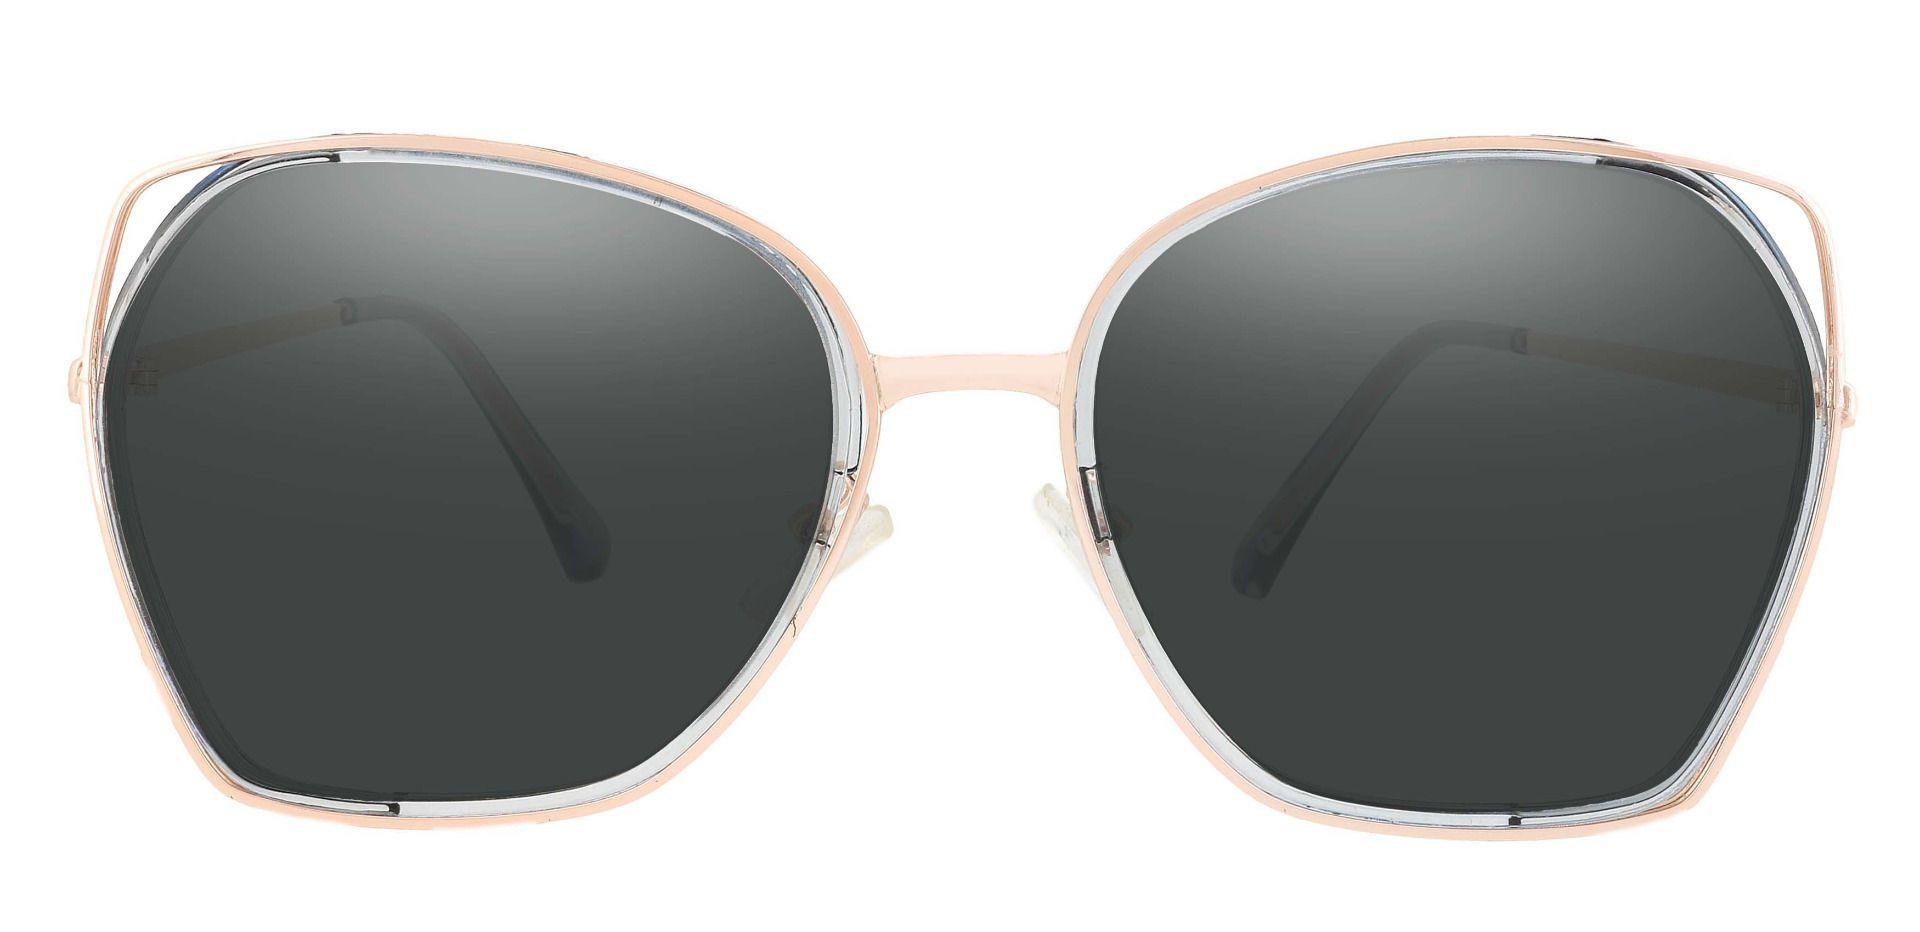 Tabby Geometric Reading Sunglasses - Blue Frame With Gray Lenses